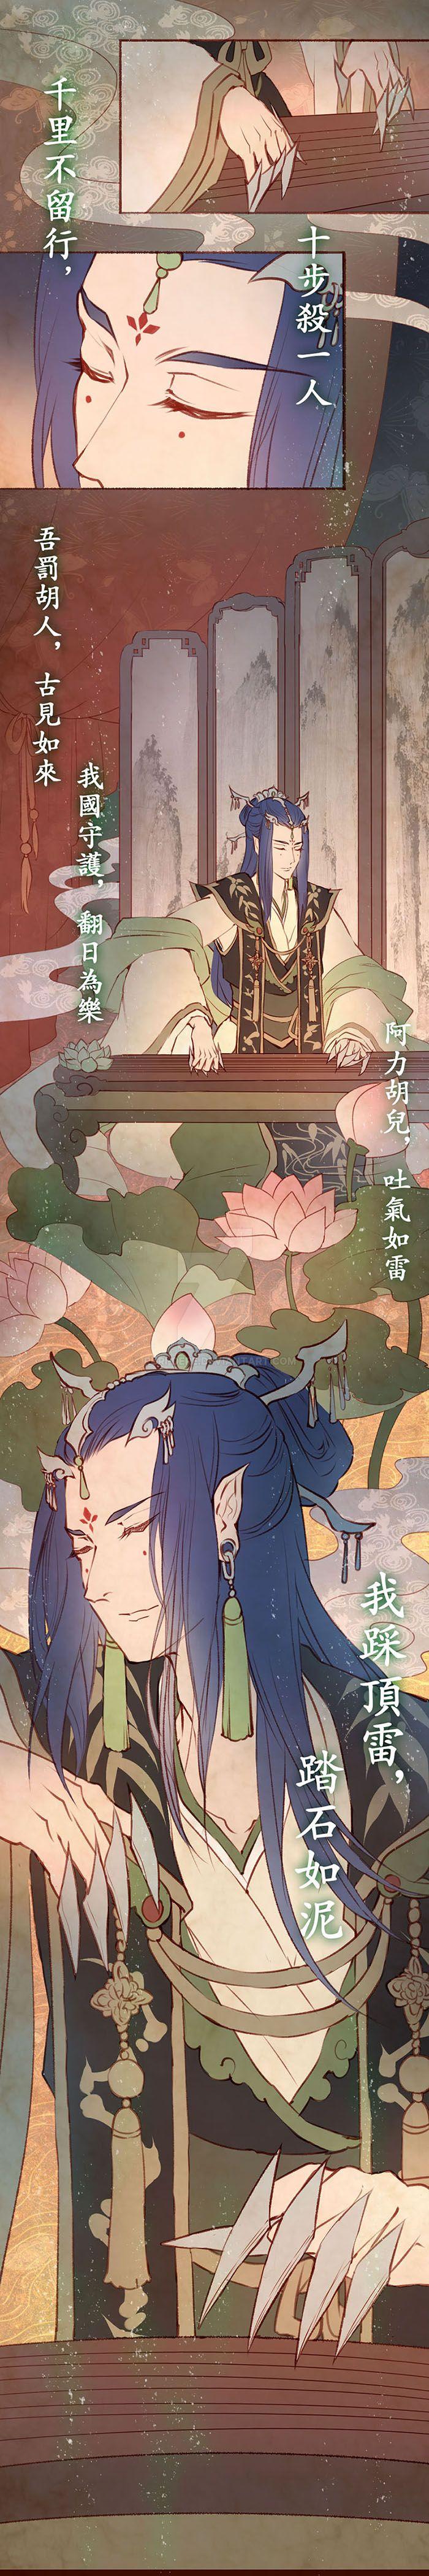 Phantom Paradise Comic Strip by Ruri-dere